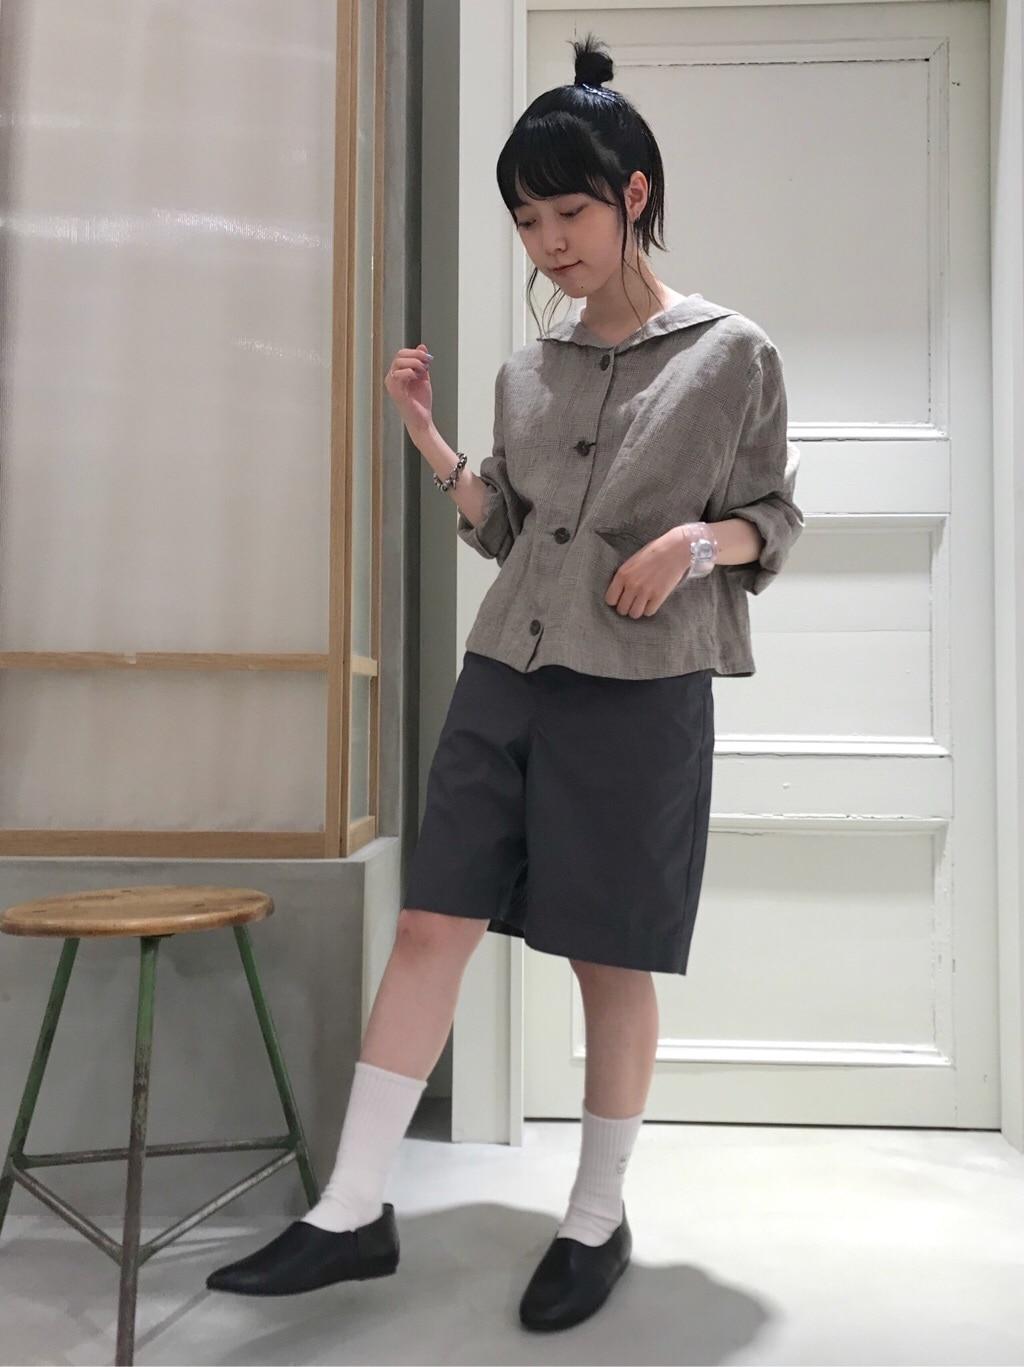 bulle de savon 渋谷スクランブルスクエア 身長:153cm 2020.06.16